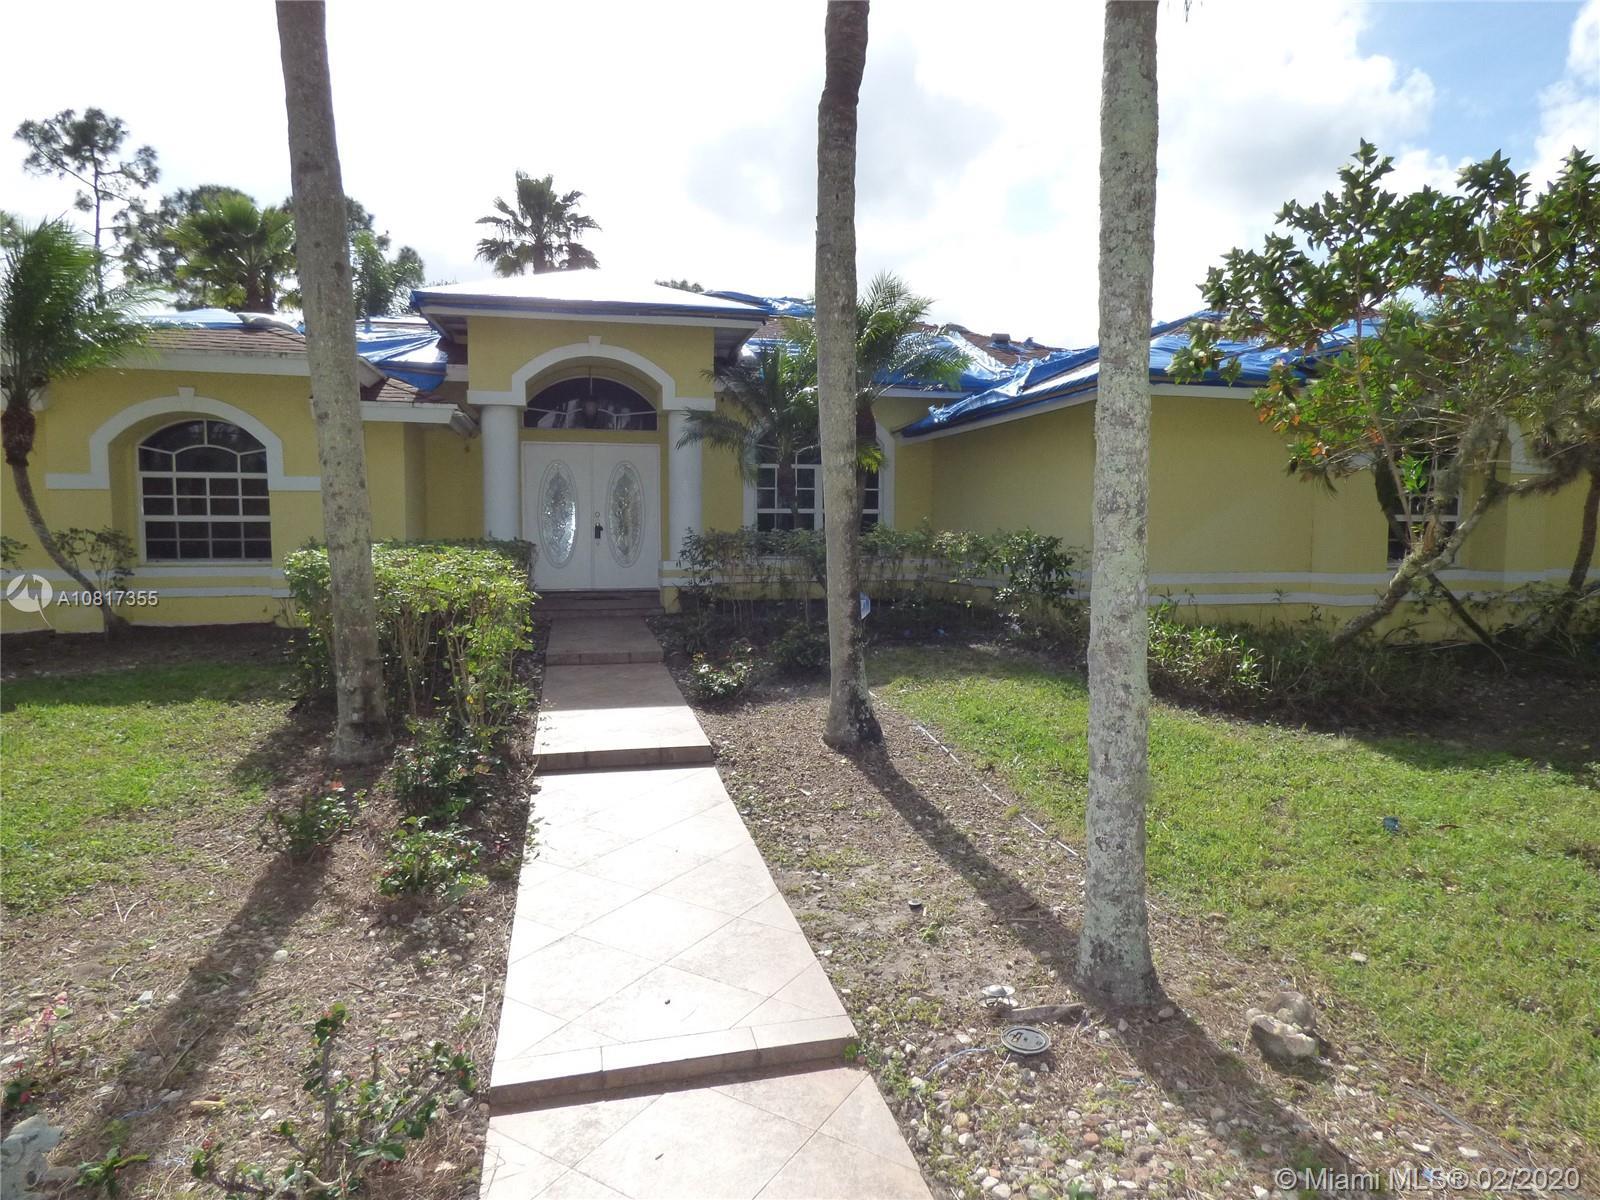 12038 Key Lime Blvd, West Palm Beach, FL 33412